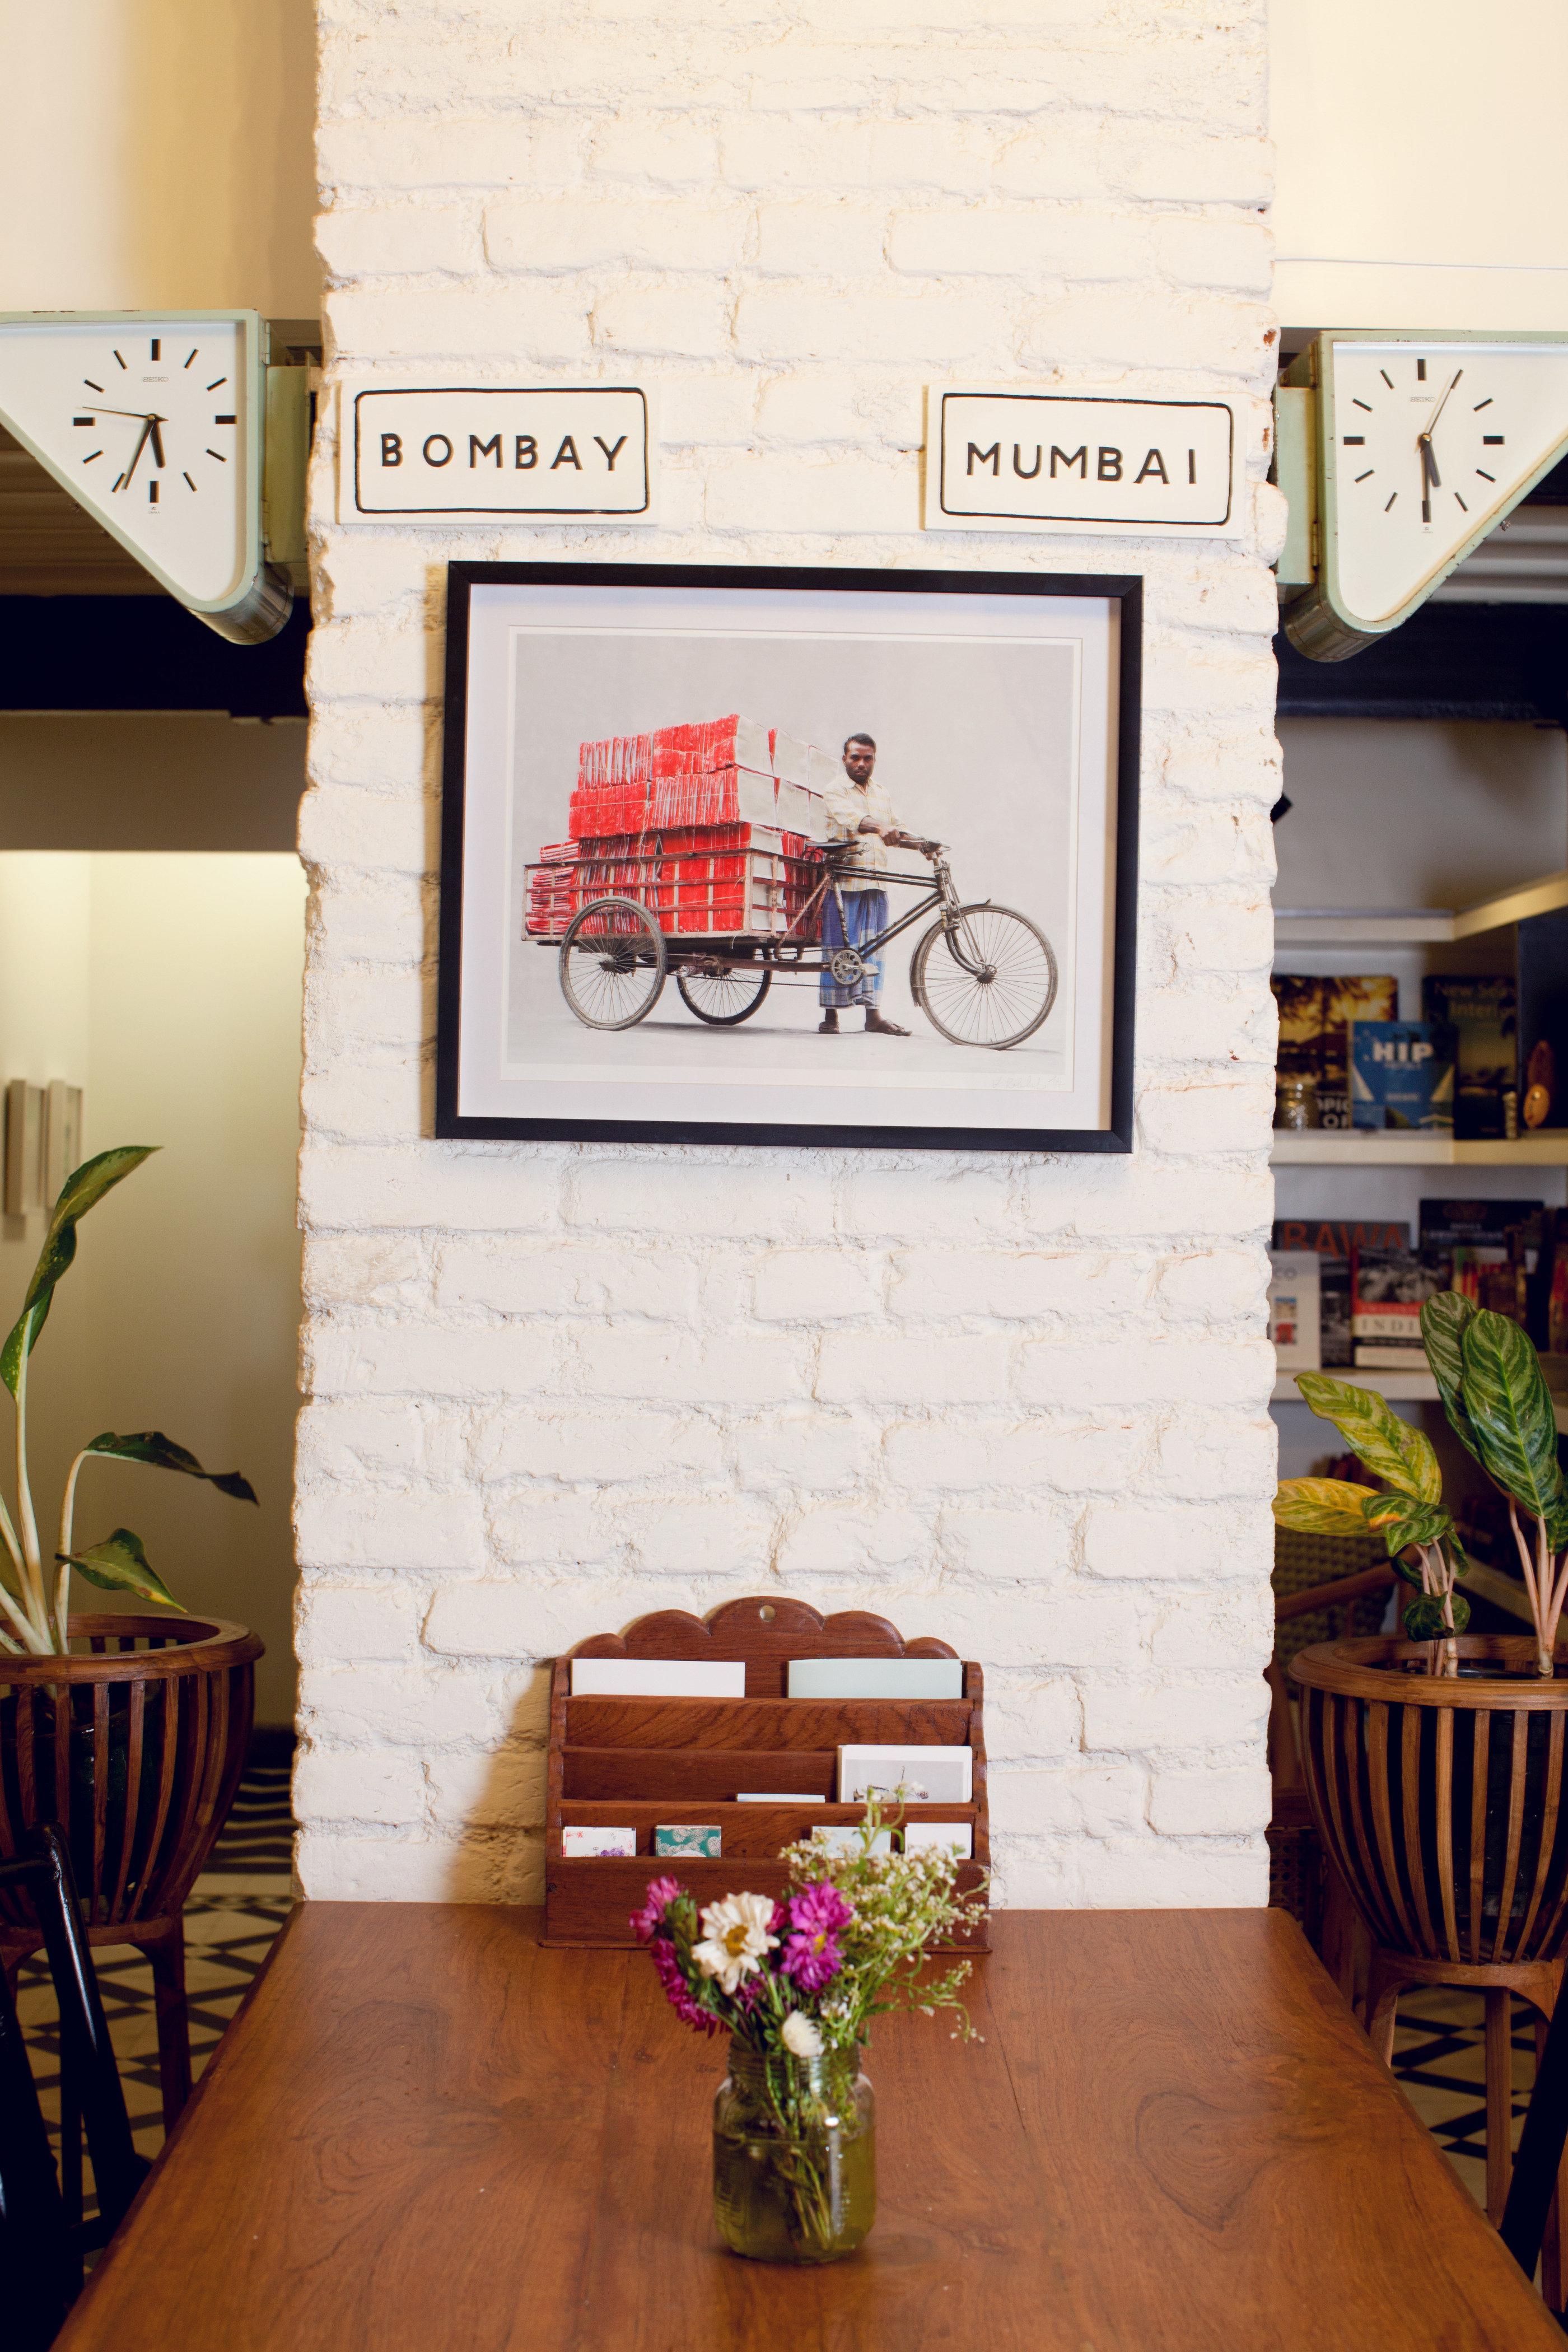 Hotels indoor floor room Living wall home interior design living room Design area furniture